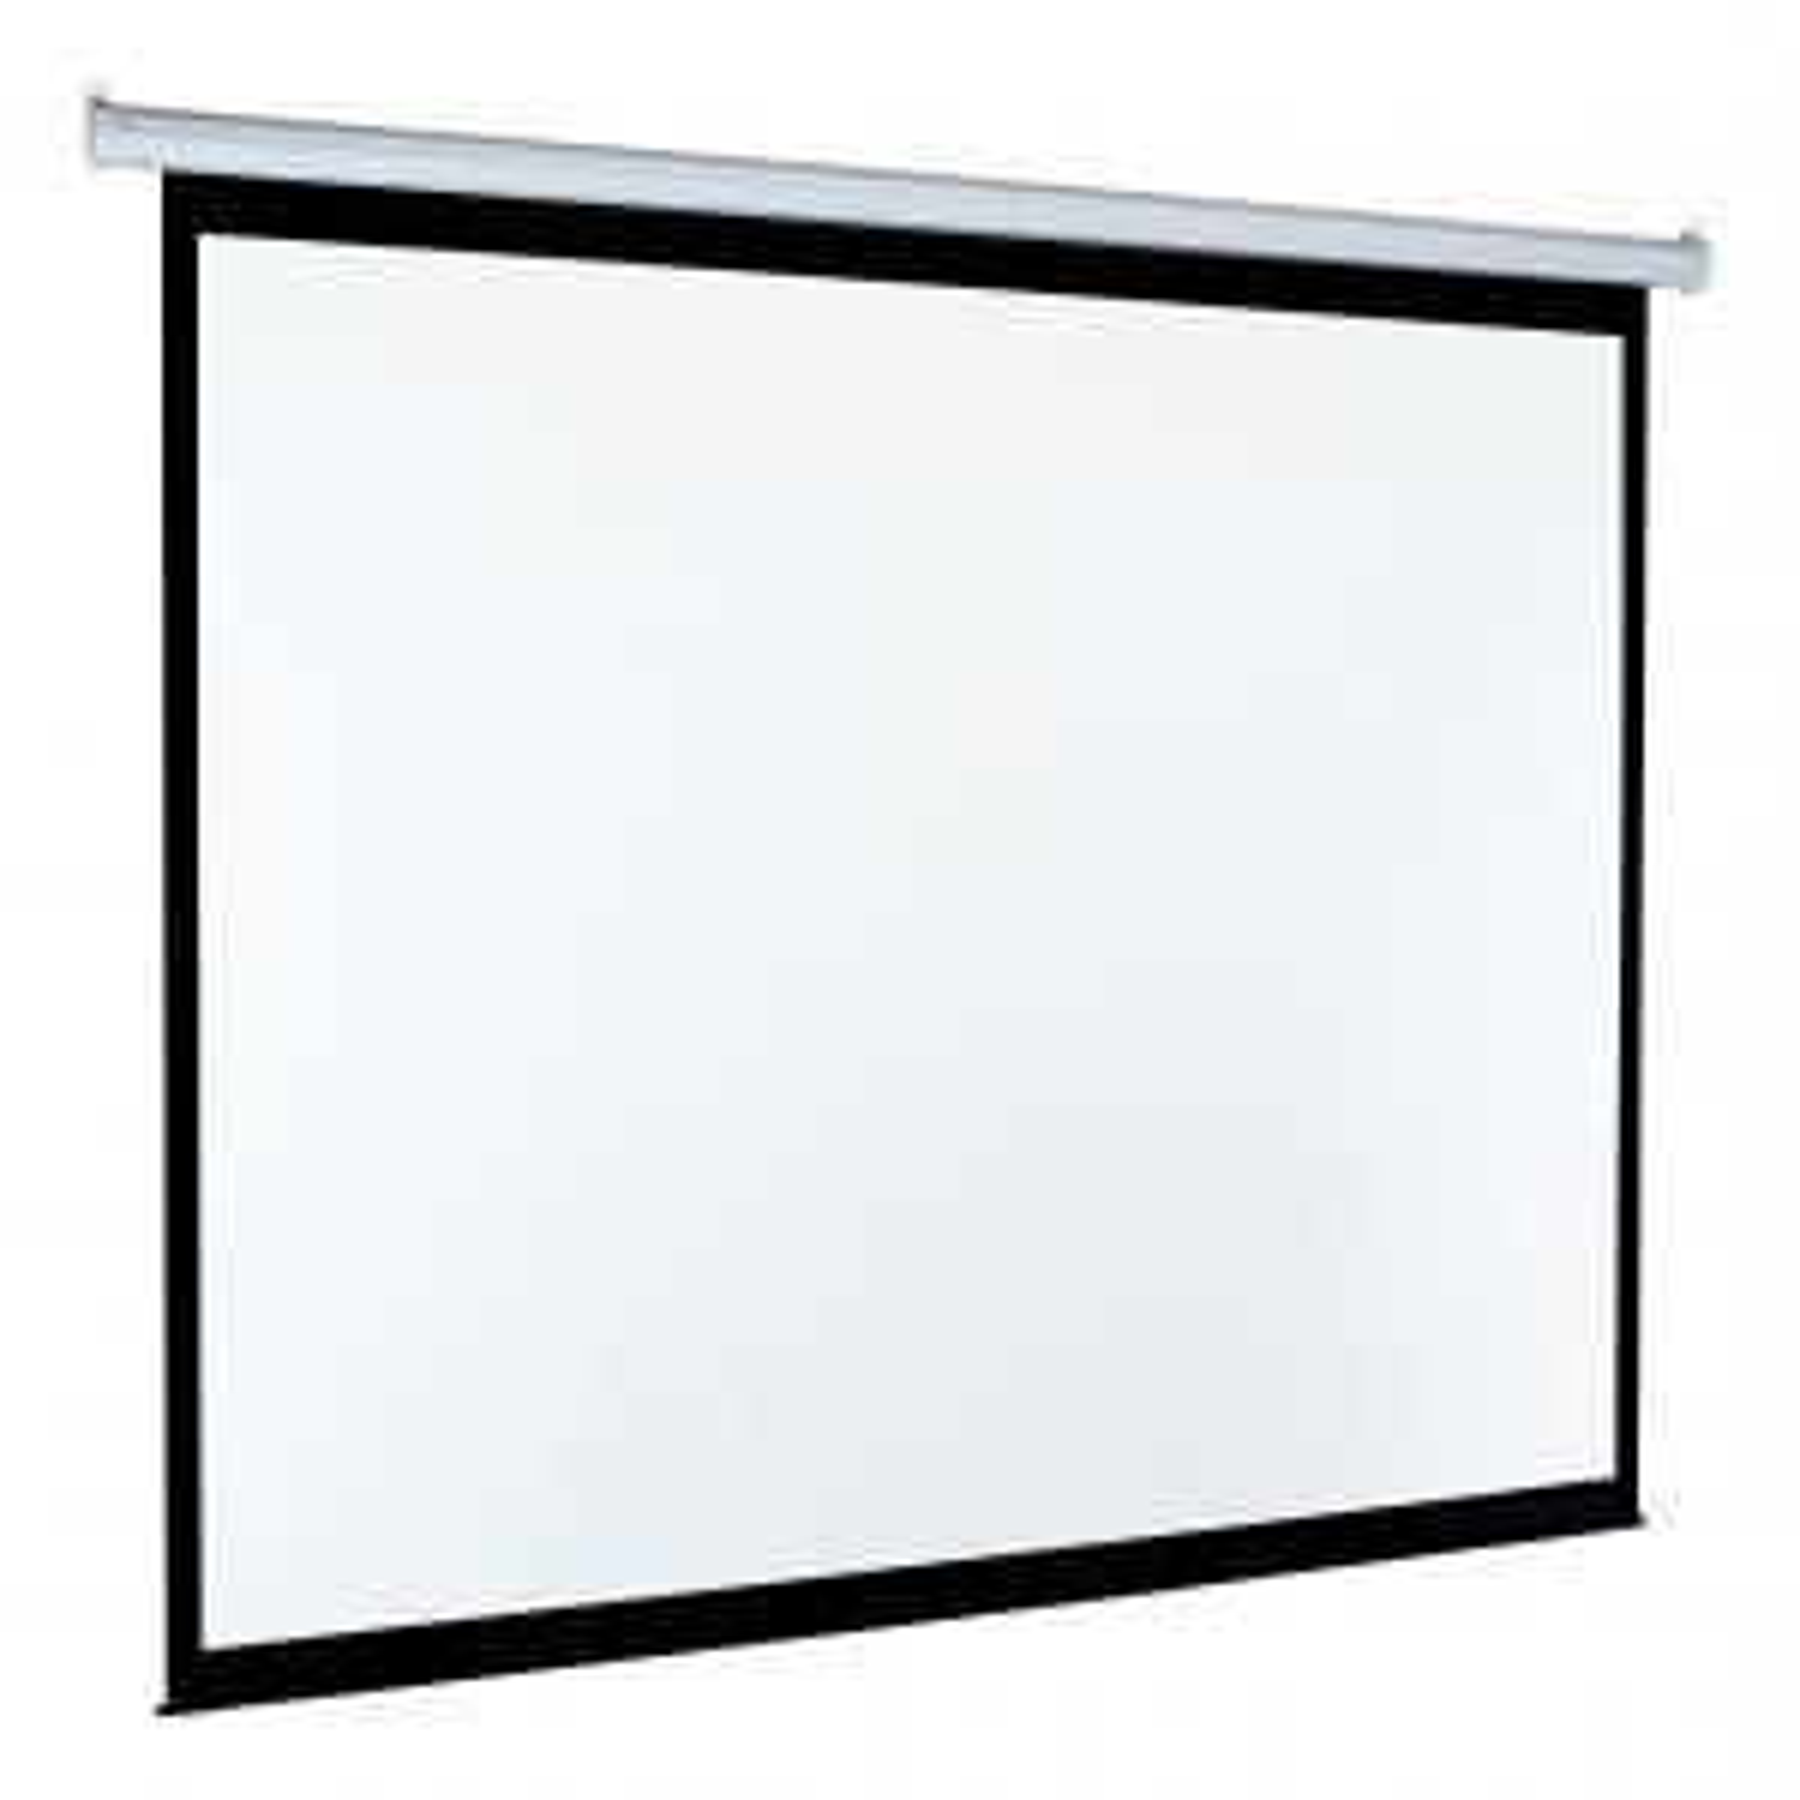 Экран Classic Solution Classic Lyra (16:9) 203x203 (E 195x110/9 MW-L8/W)